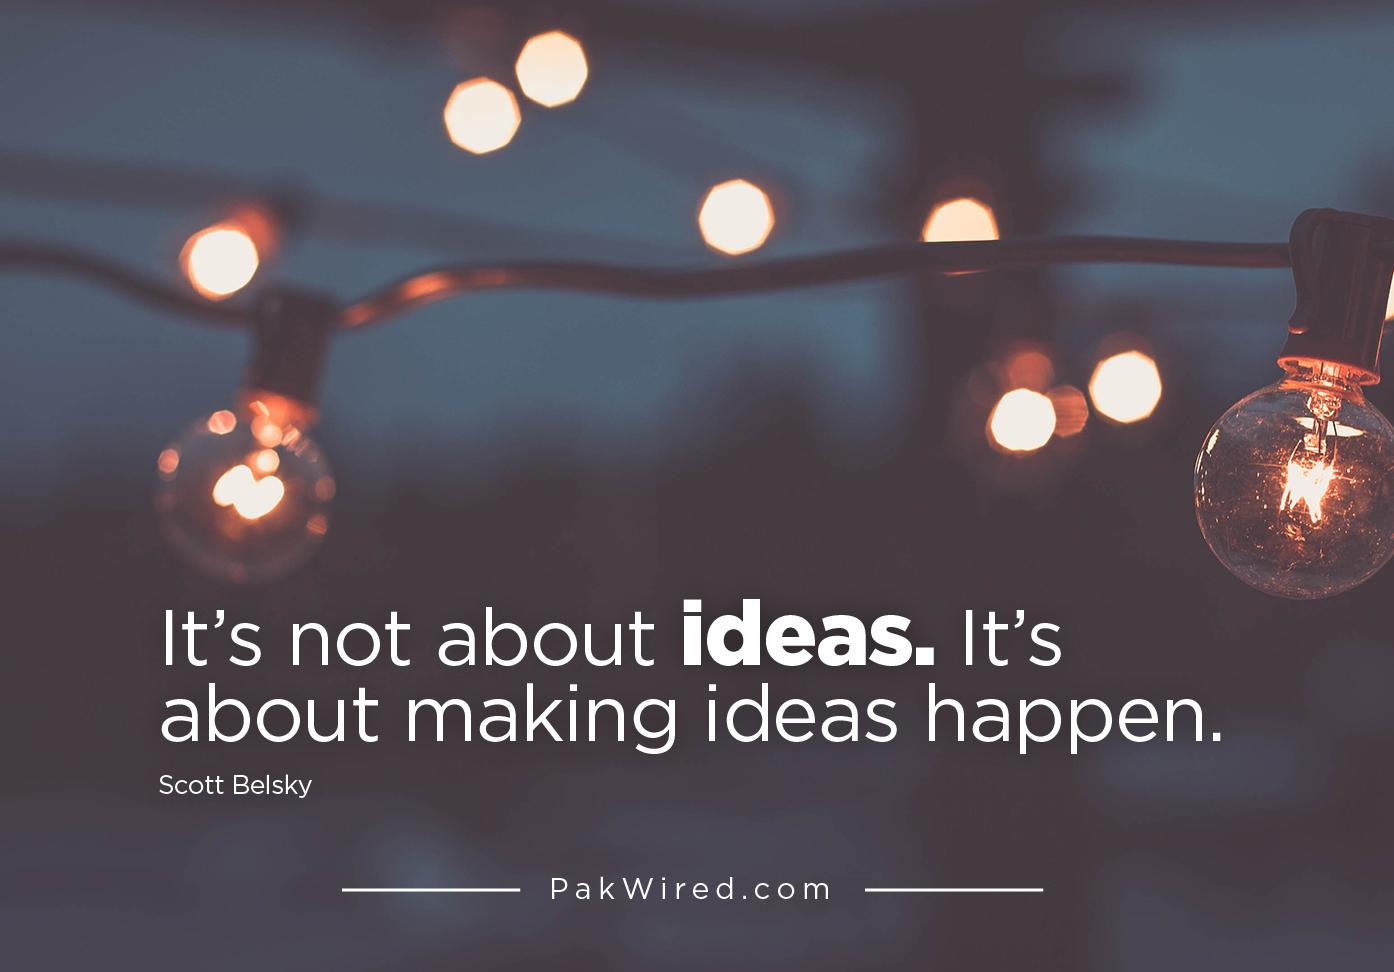 It_s not about ideas. It_s about making ideas happen-01